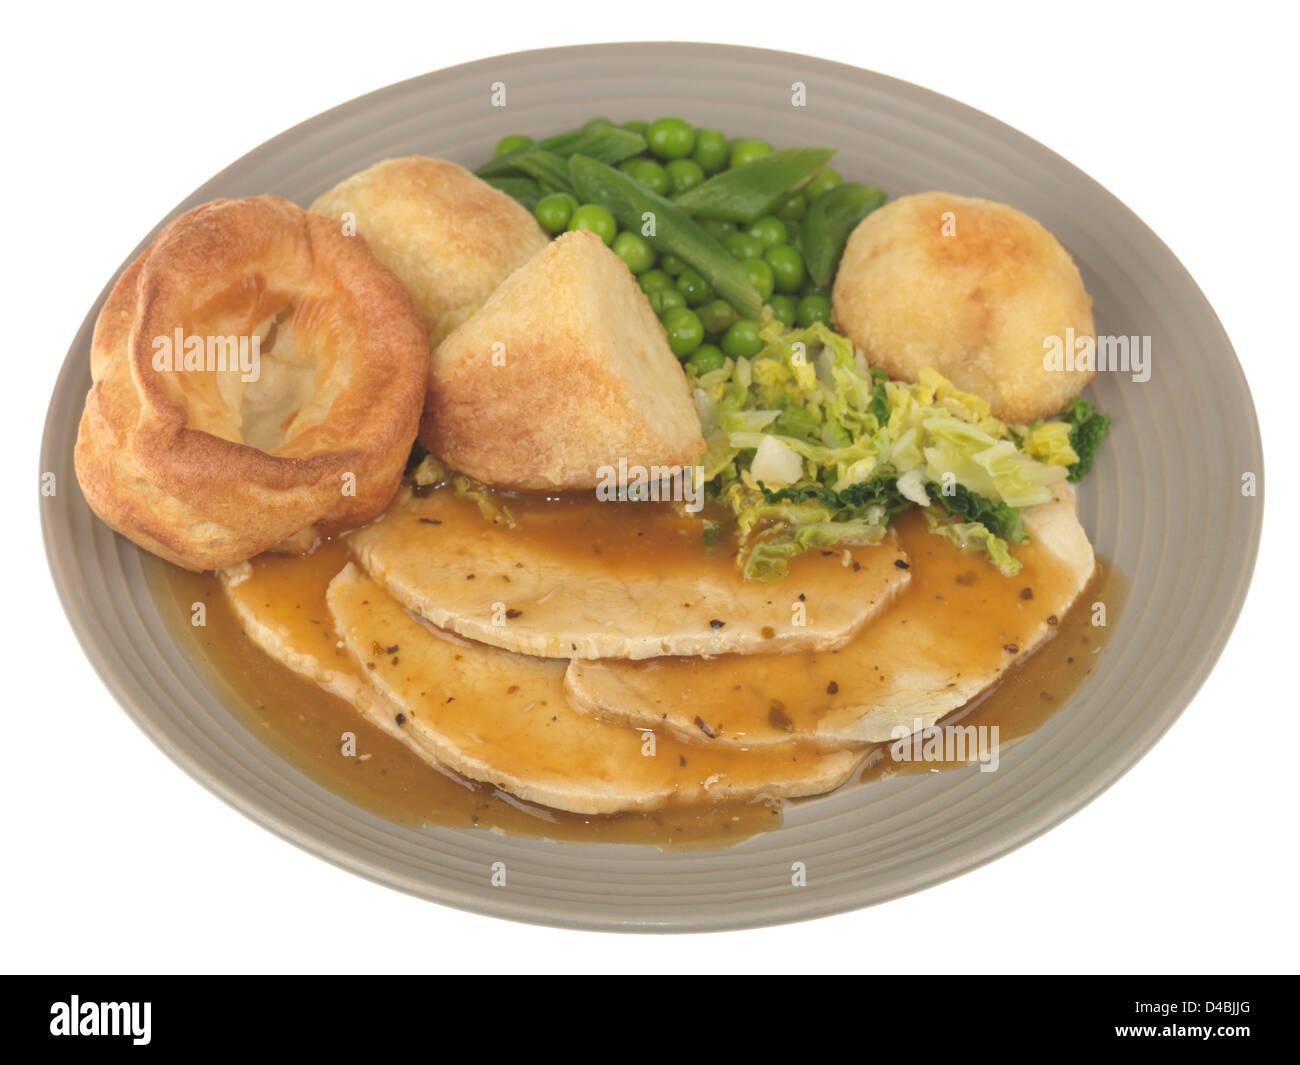 Roast Pork with Vegetables Stock Photo